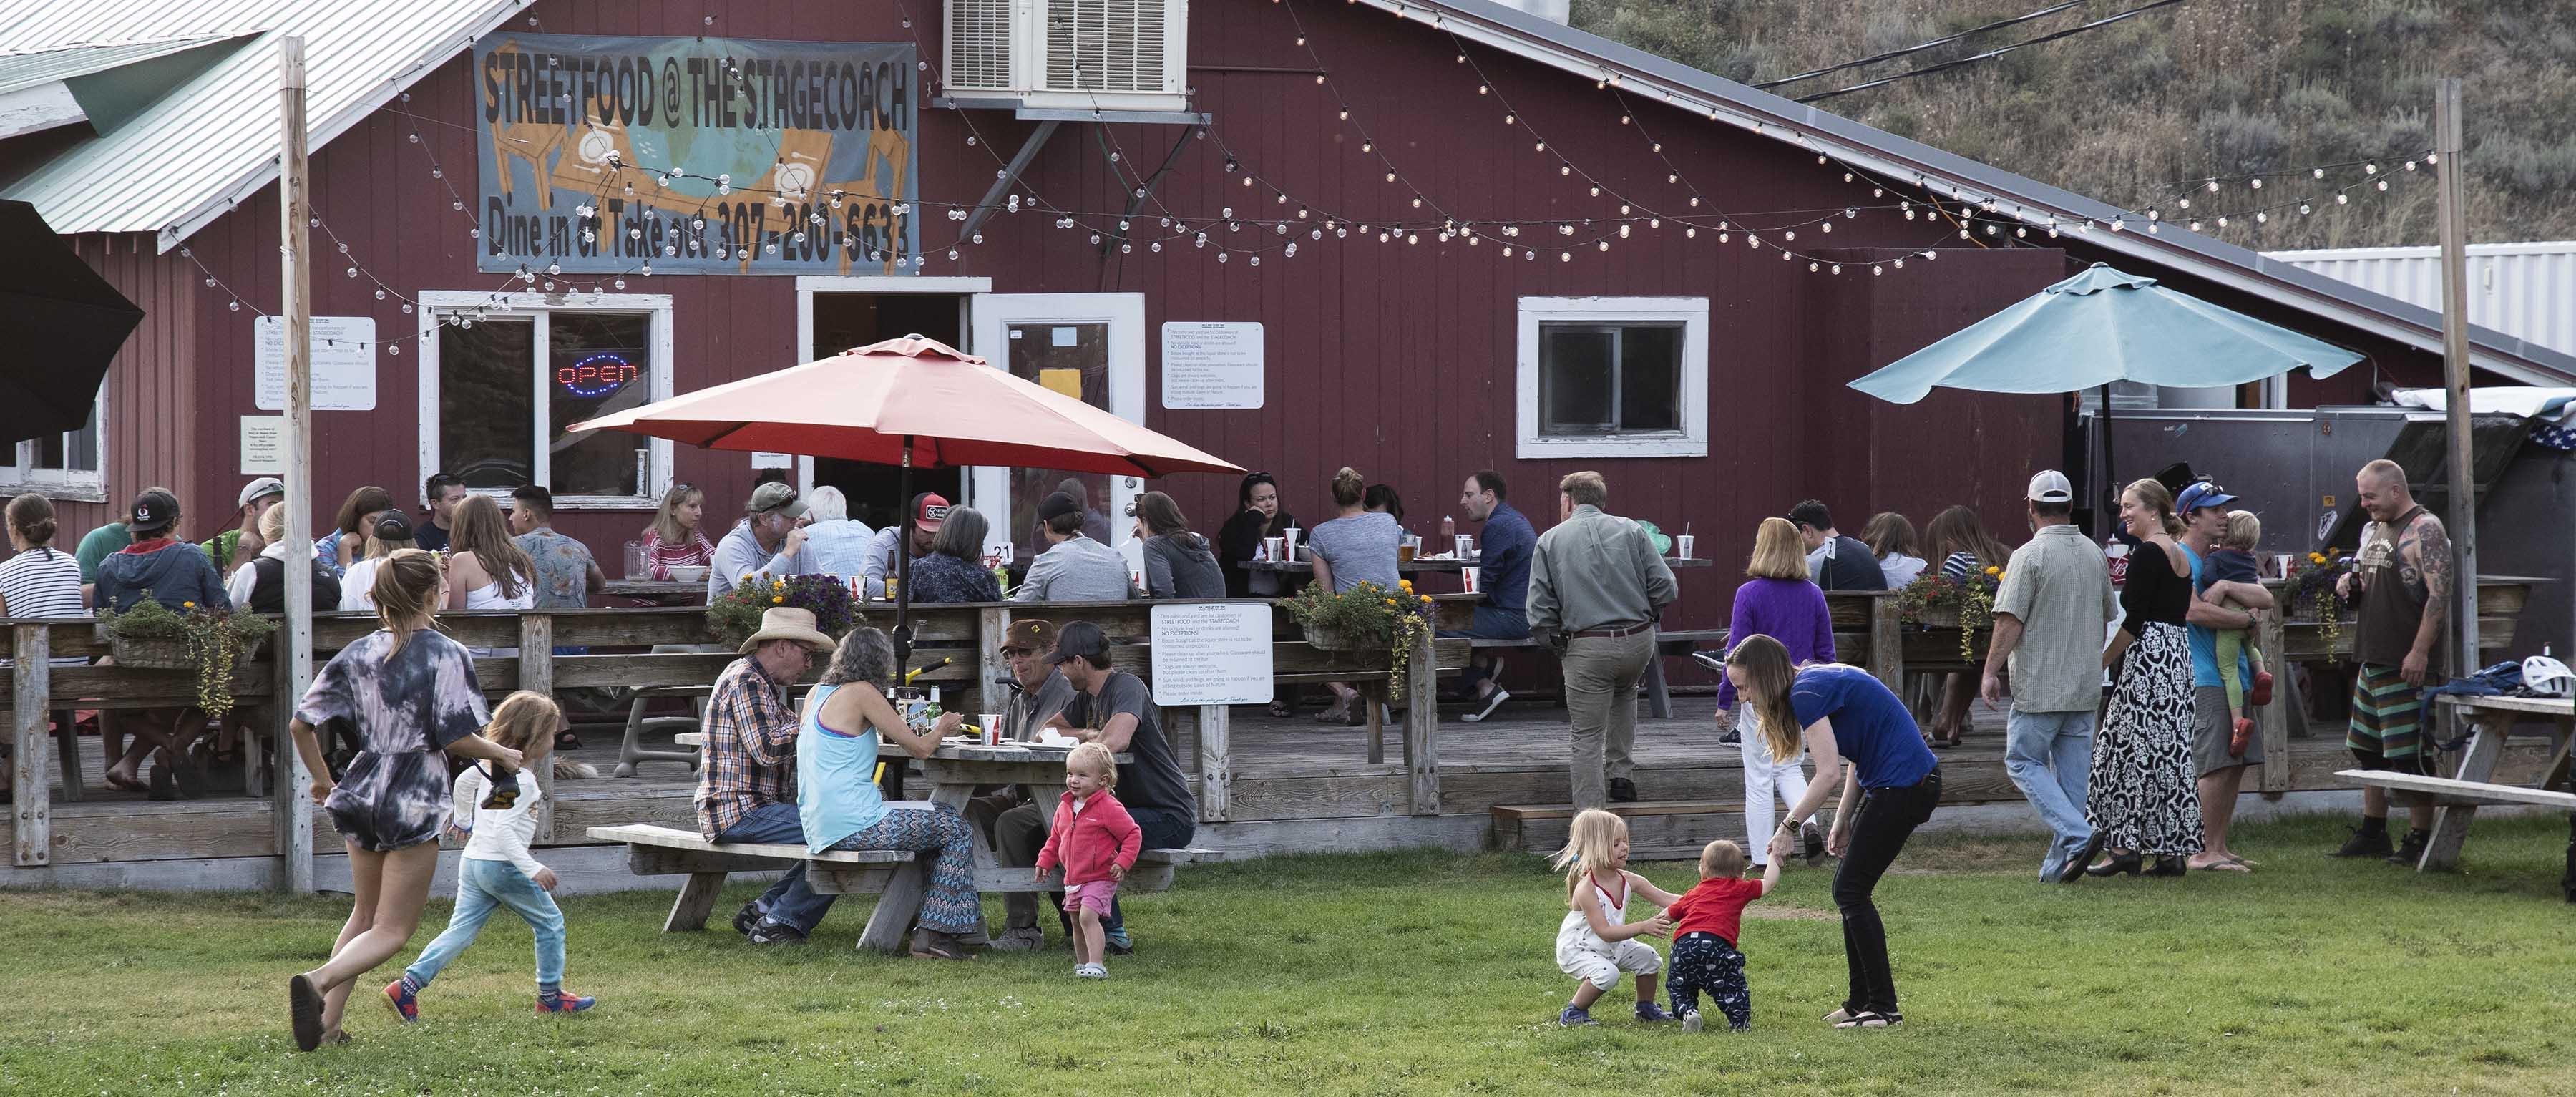 Stagecoach Lawn - Jackson Hole